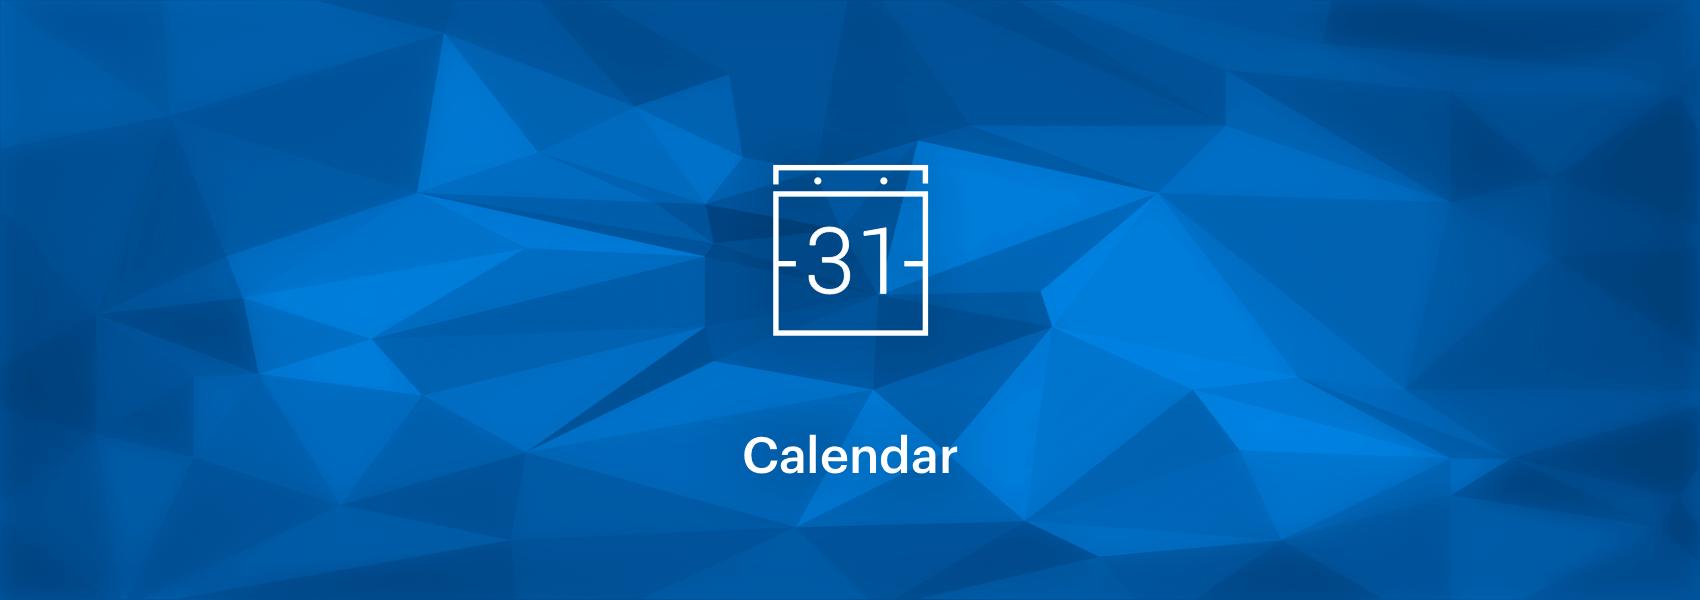 GitHub - MarcBruins/material-calendarview-xamarin-android: Binding